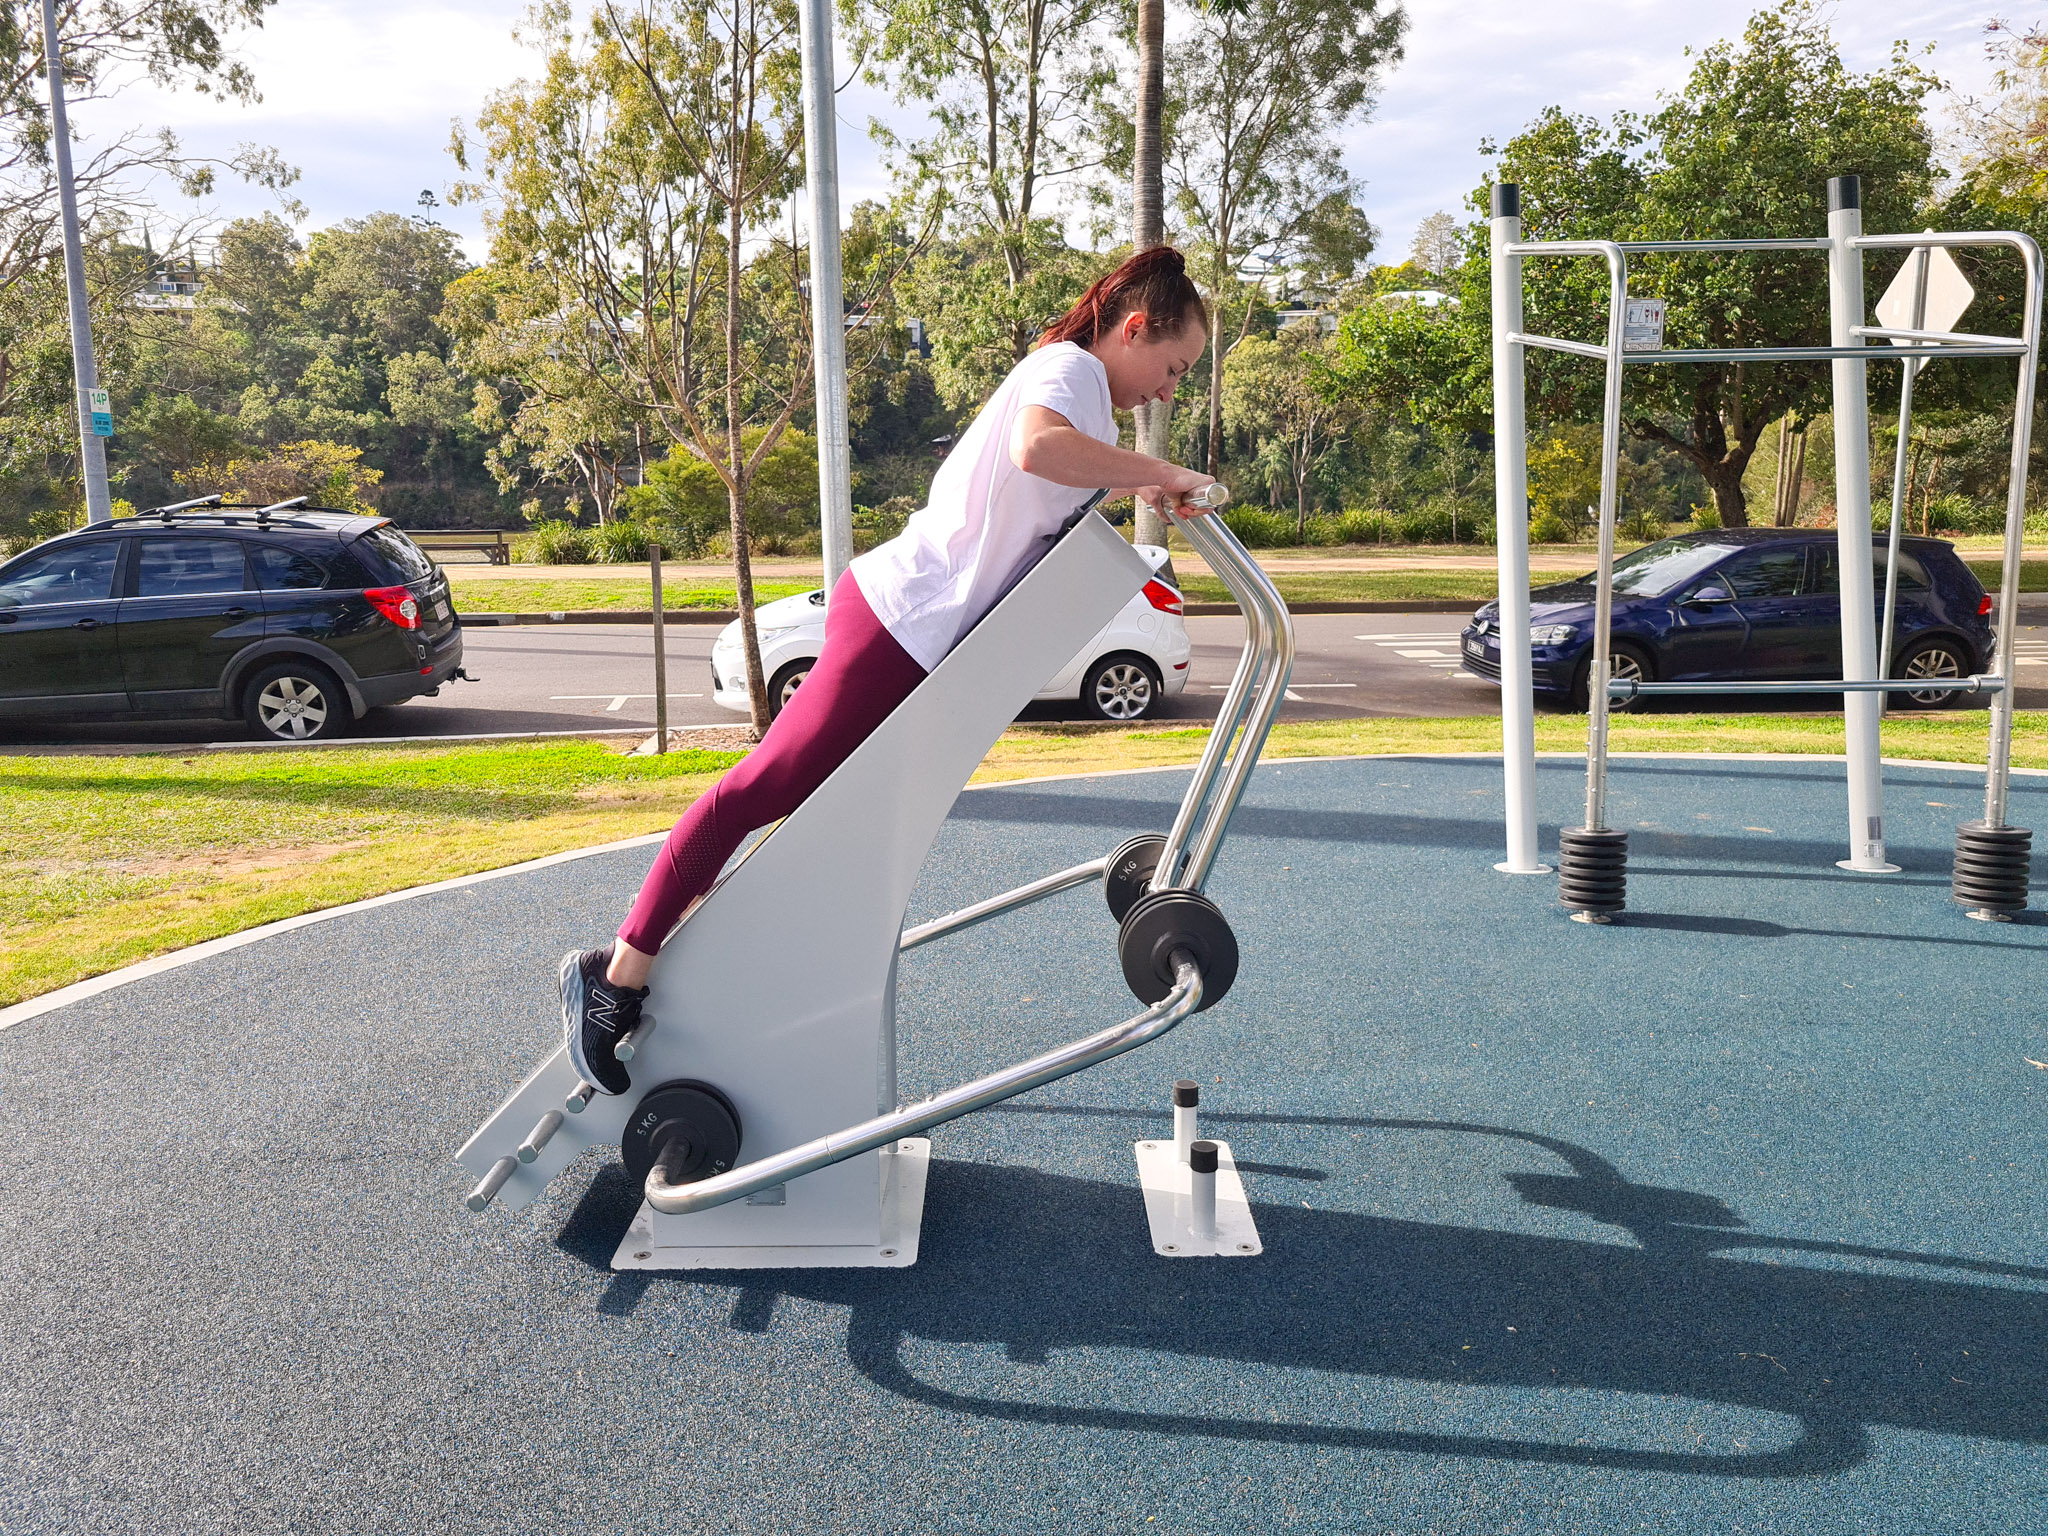 uq-outdoor-fitness-austek-play-brisbane-25